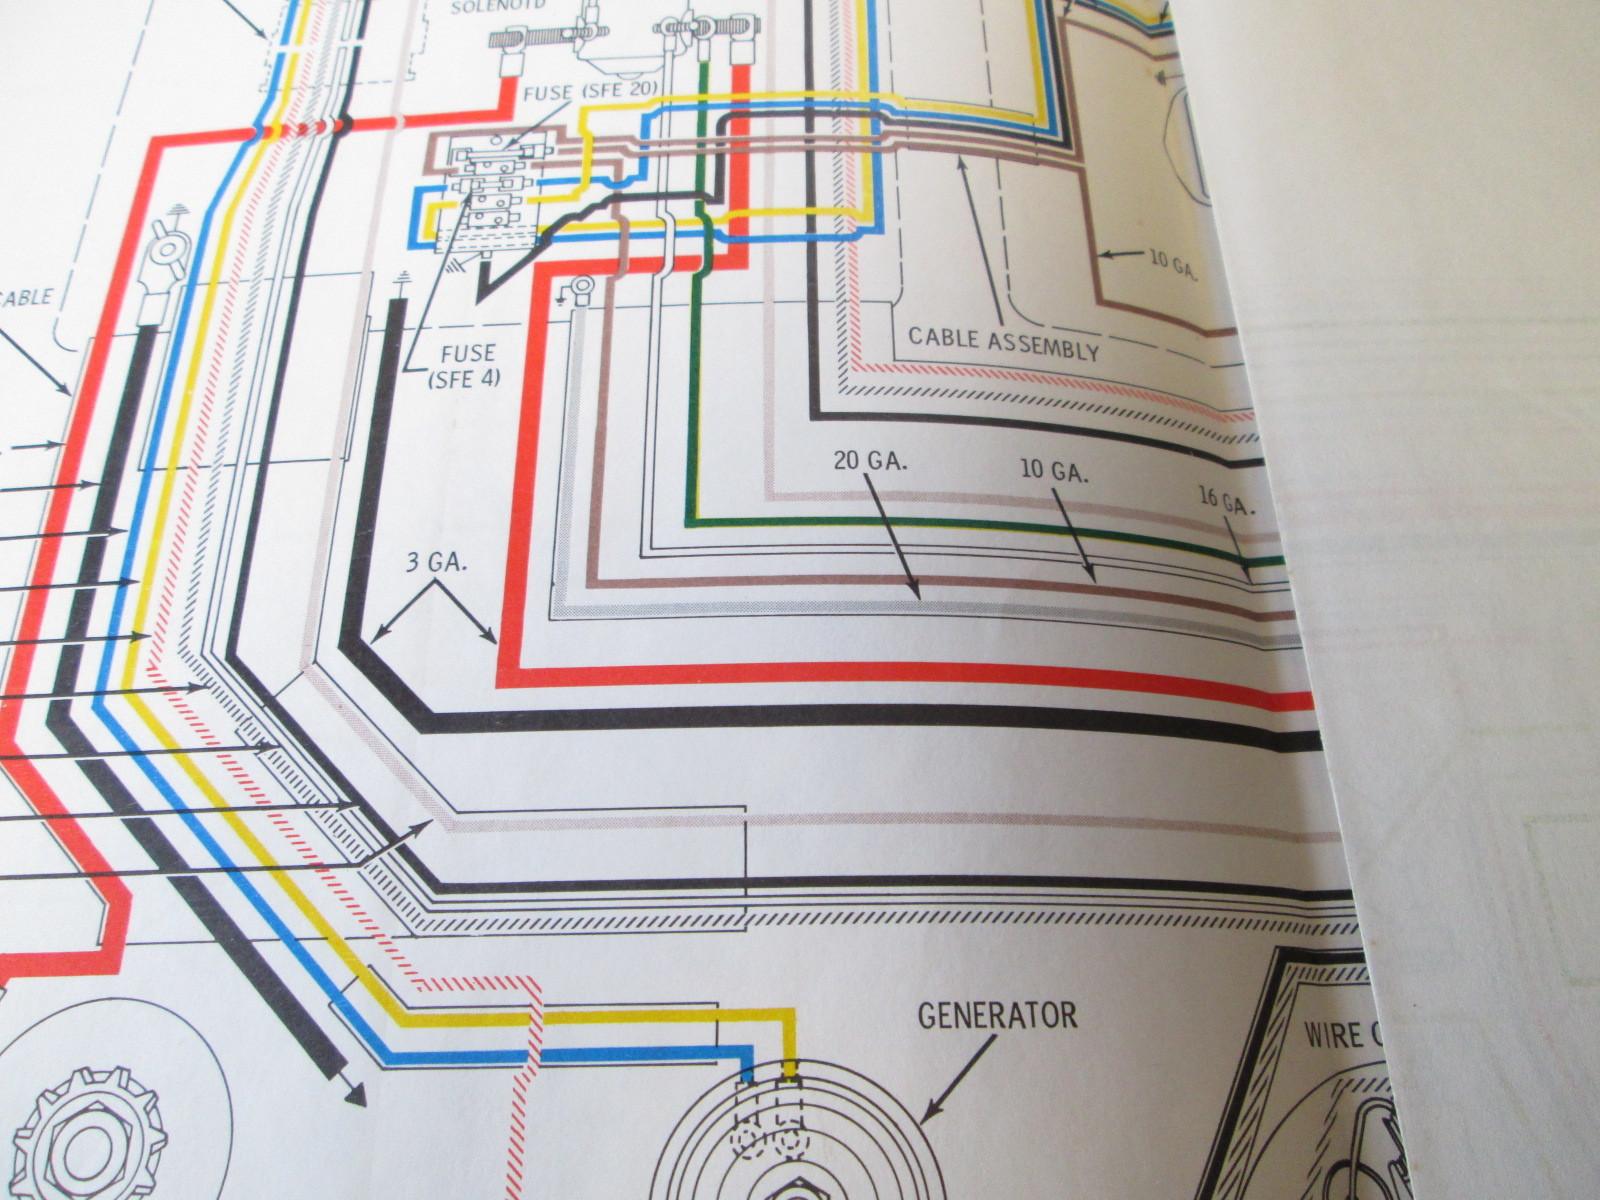 Brilliant 92 Mercury Capri Engine Wiring Diagram Schematic Diagram Download Wiring Cloud Histehirlexornumapkesianilluminateatxorg